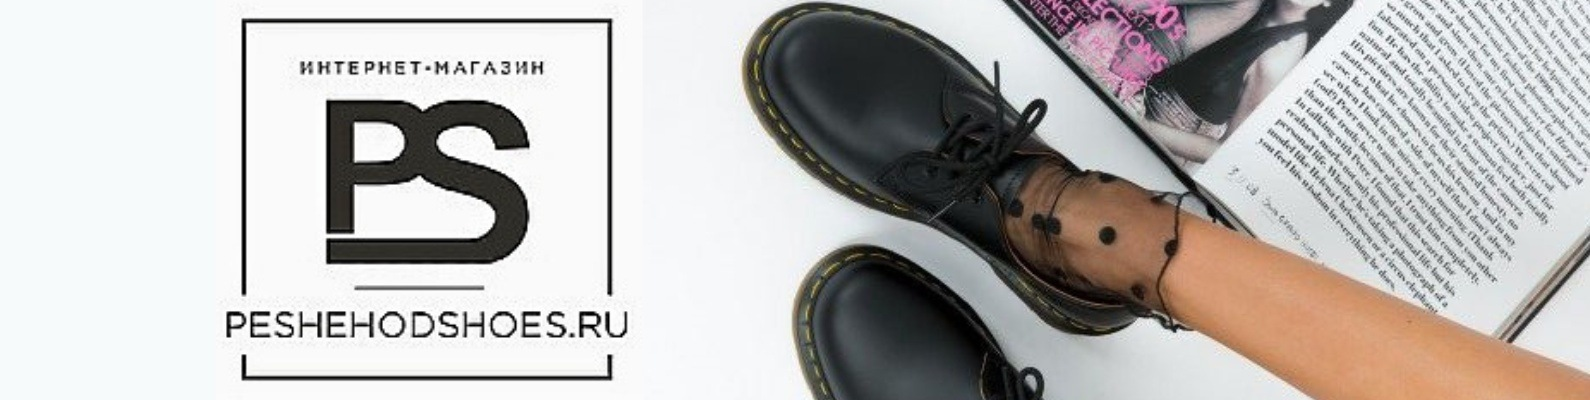 21cb1235422b Интернет-магазин обуви PESHEHODSHOES   ВКонтакте